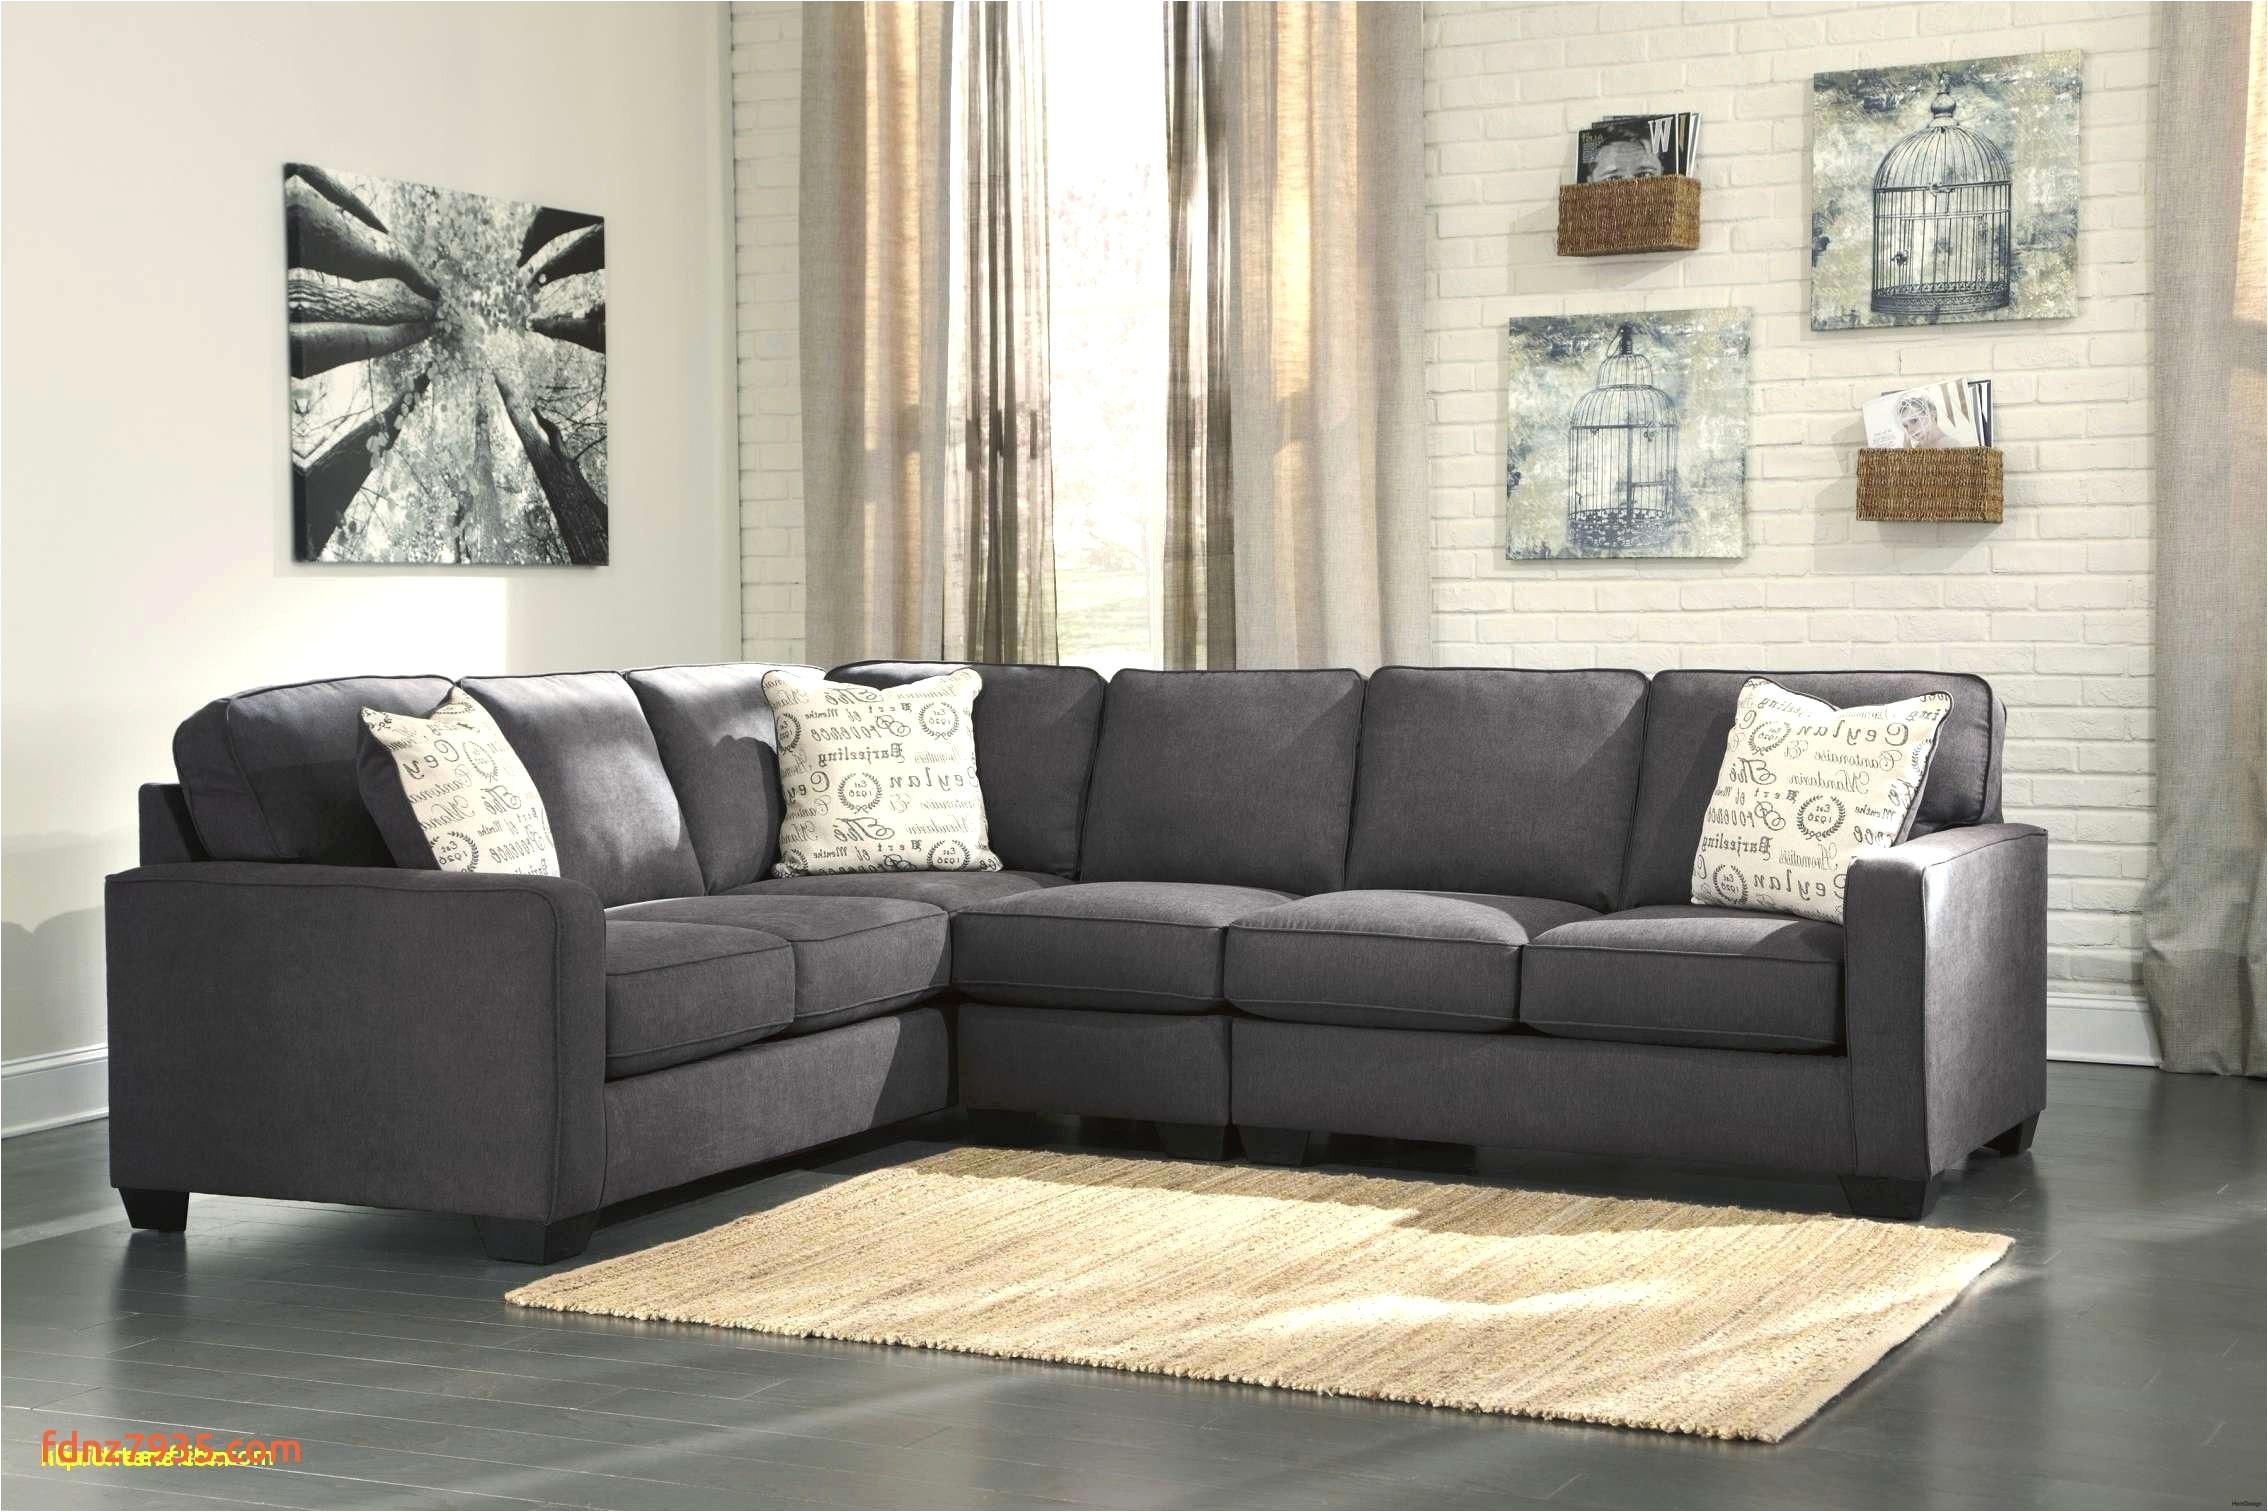 Furniture Stores Joplin Mo